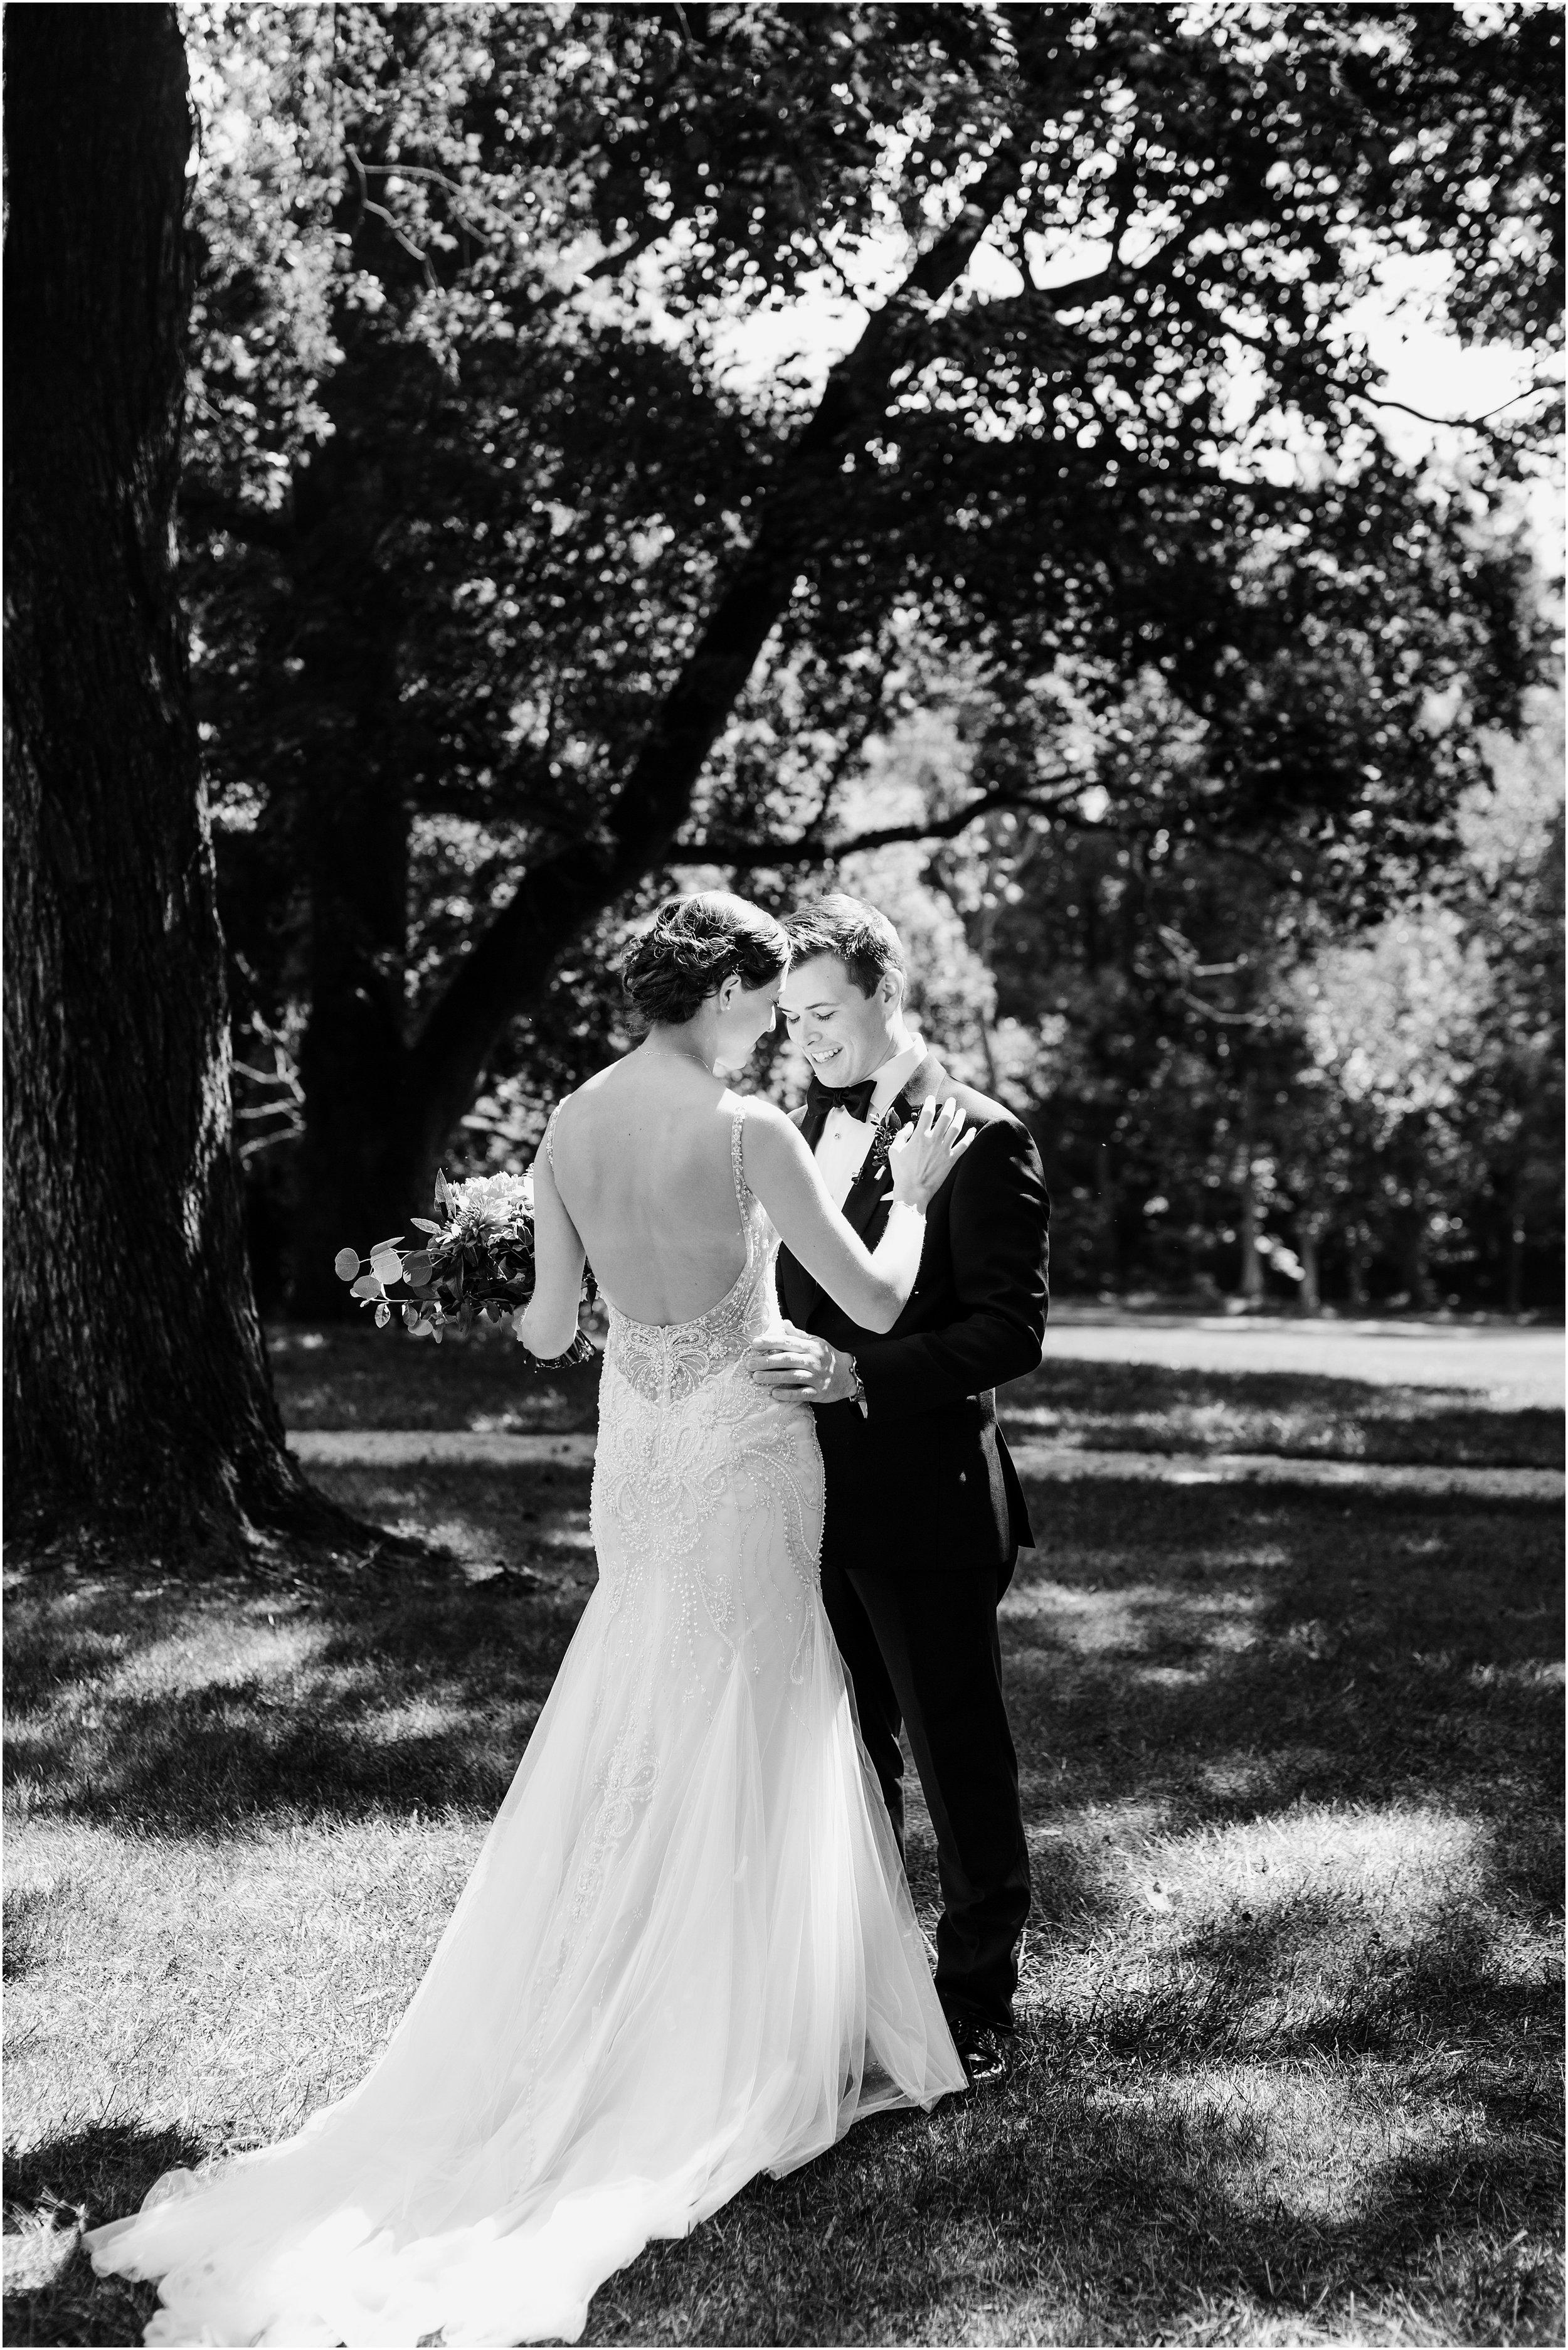 hannah leigh photography Antrim 1844 Wedding_1171.jpg